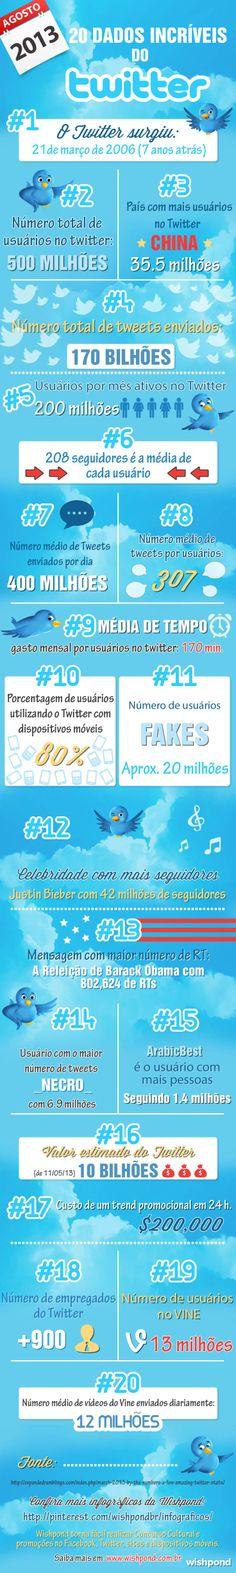 20 dados incríveis do Twitter #Infografico #socialmedia #Twitter